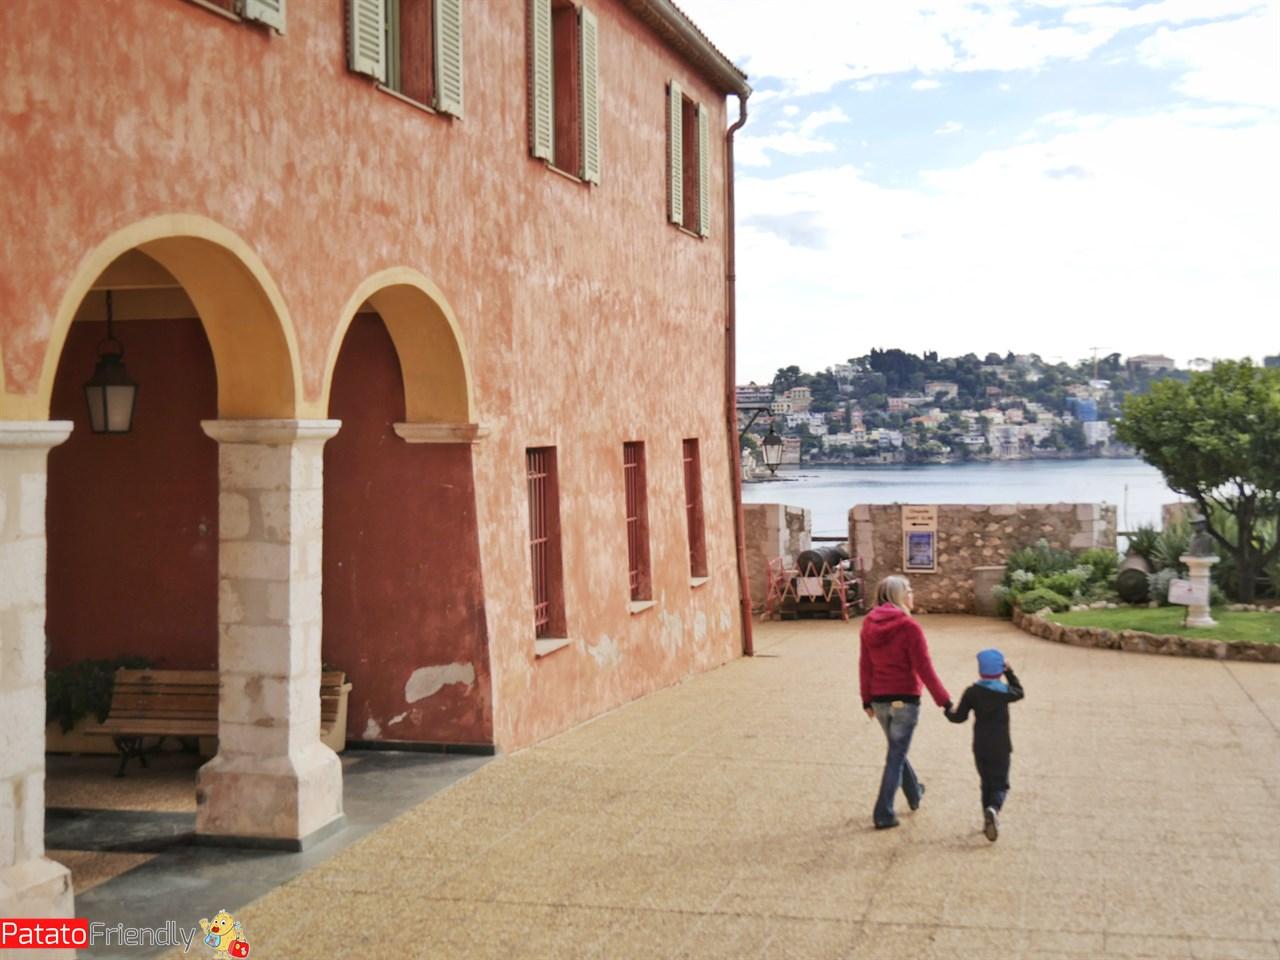 [cml_media_alt id='13699']La Cittadelle di Villefranche-sur-mer in Costa Azzurra[/cml_media_alt]